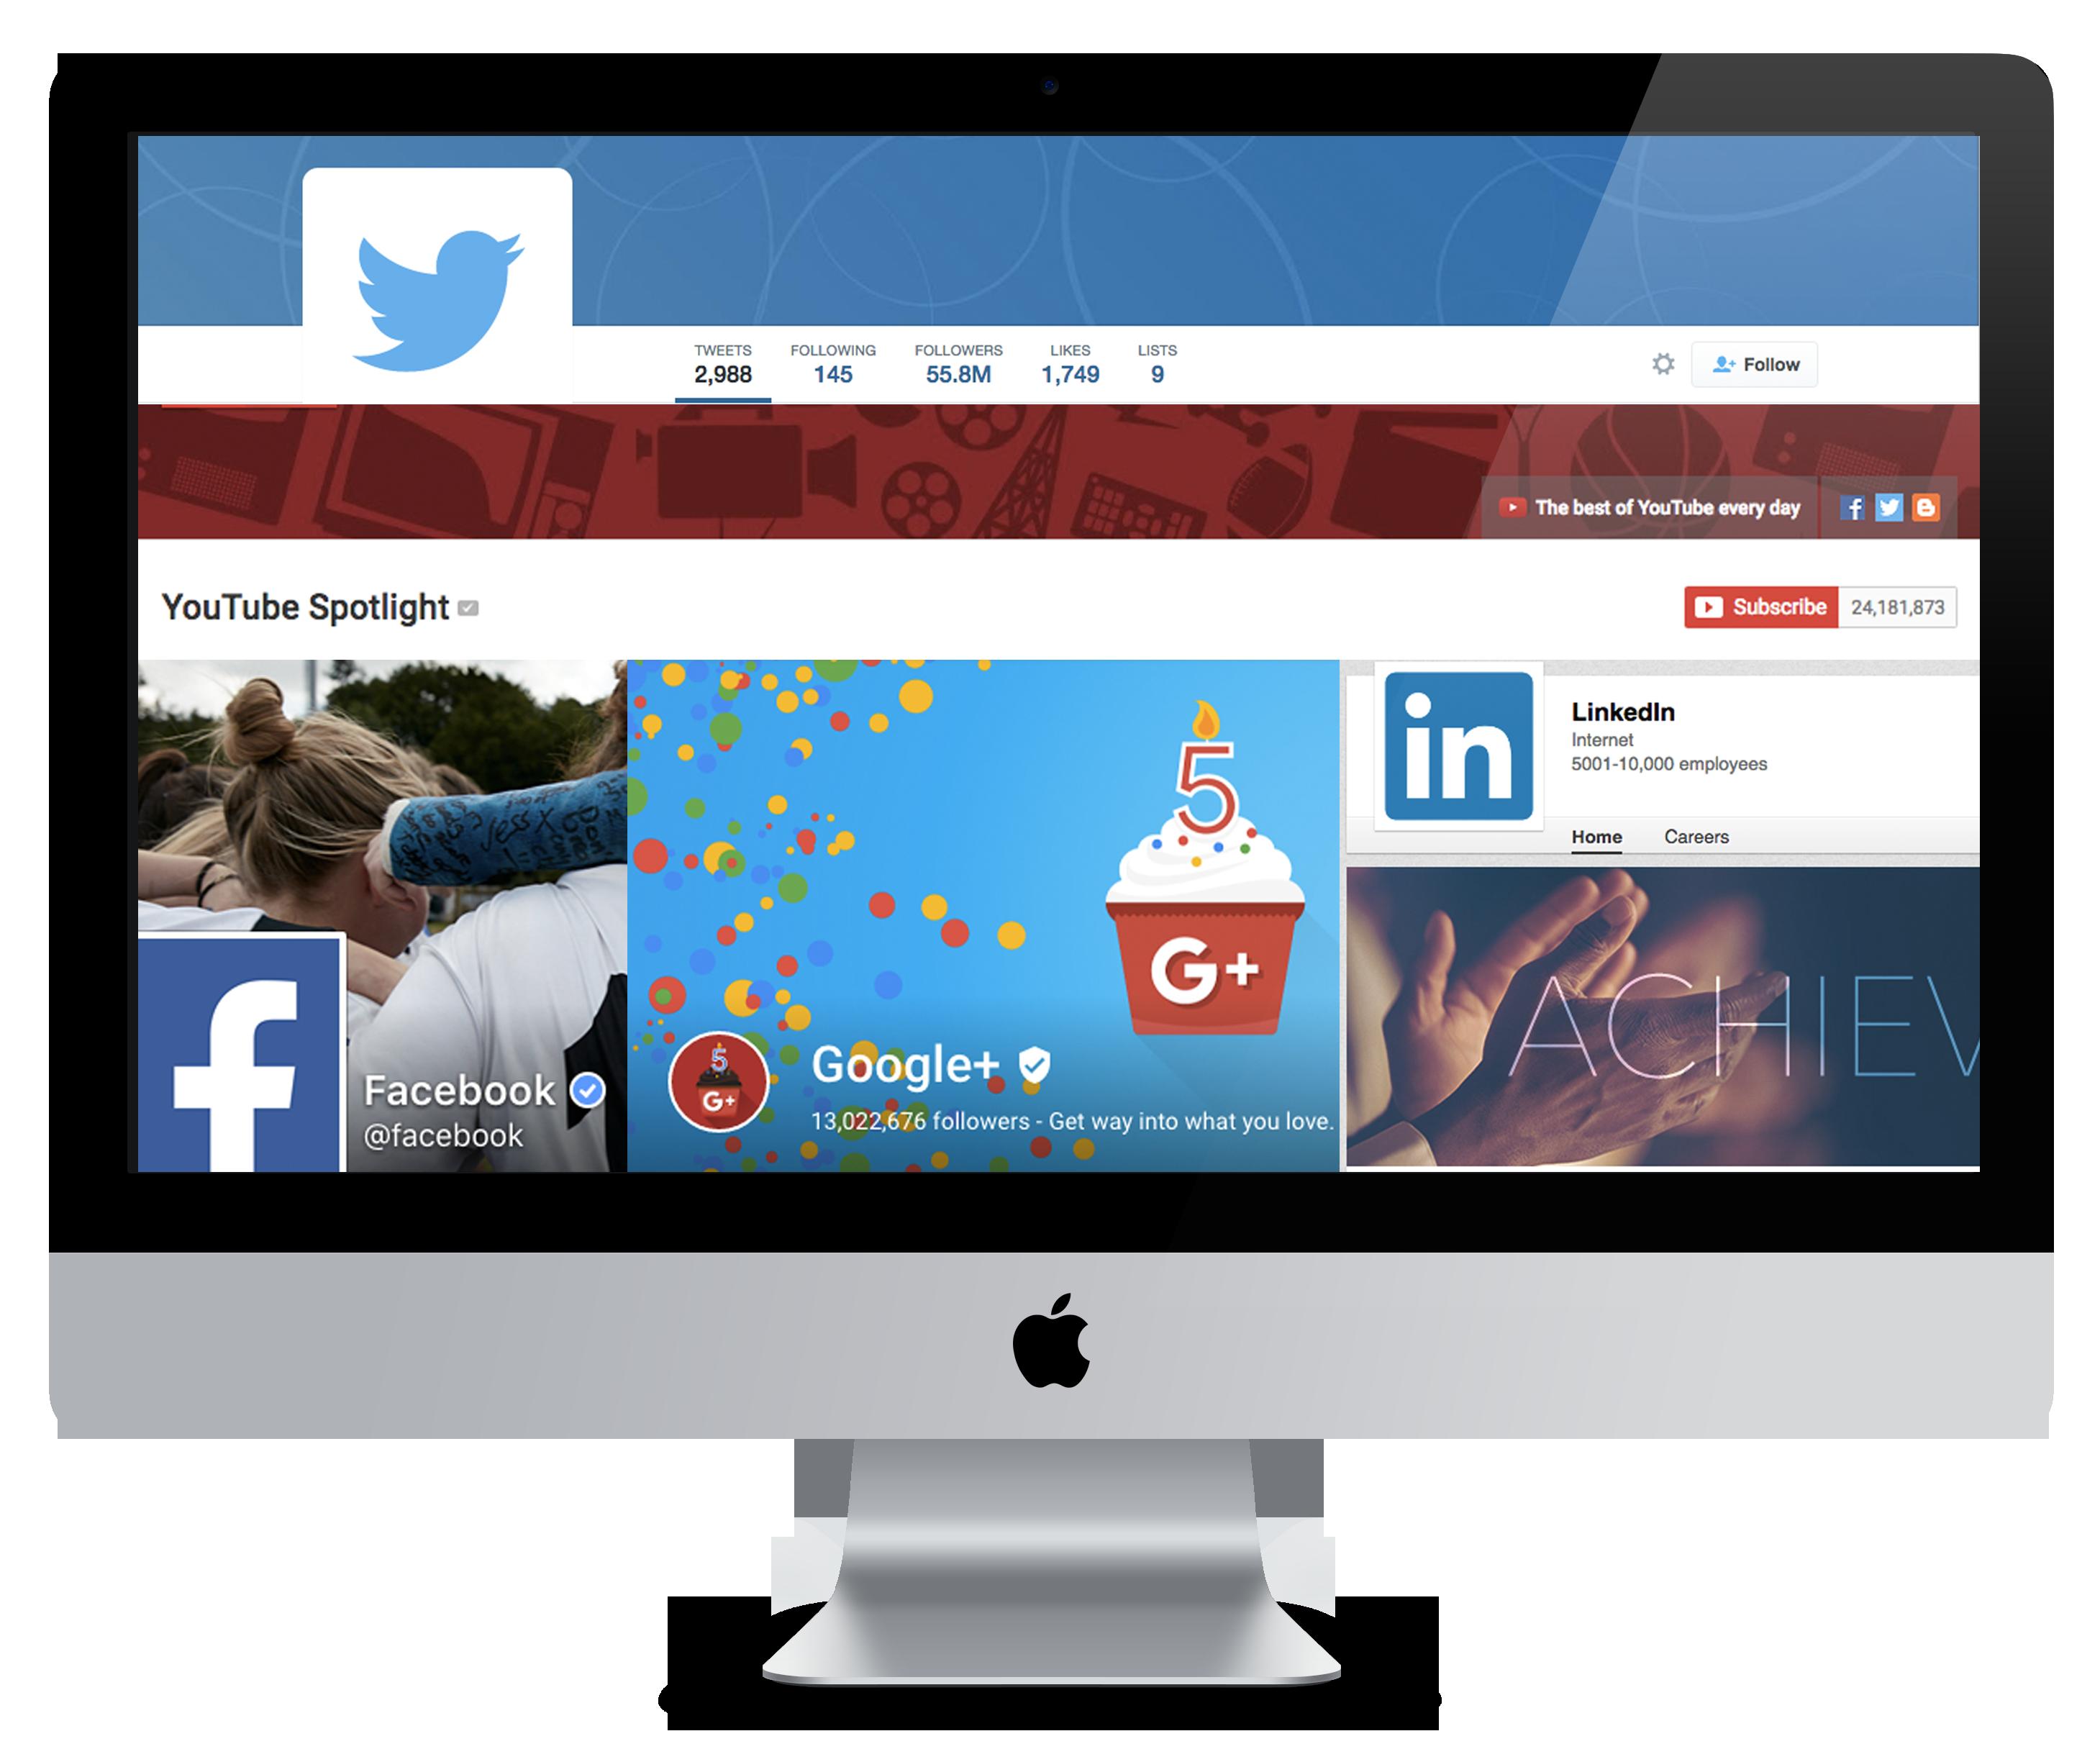 Social Media Cover Photo Templates Easily Create Beautiful Cover Photos For All Your Social Media S Free Social Media Templates Free Social Media Social Media